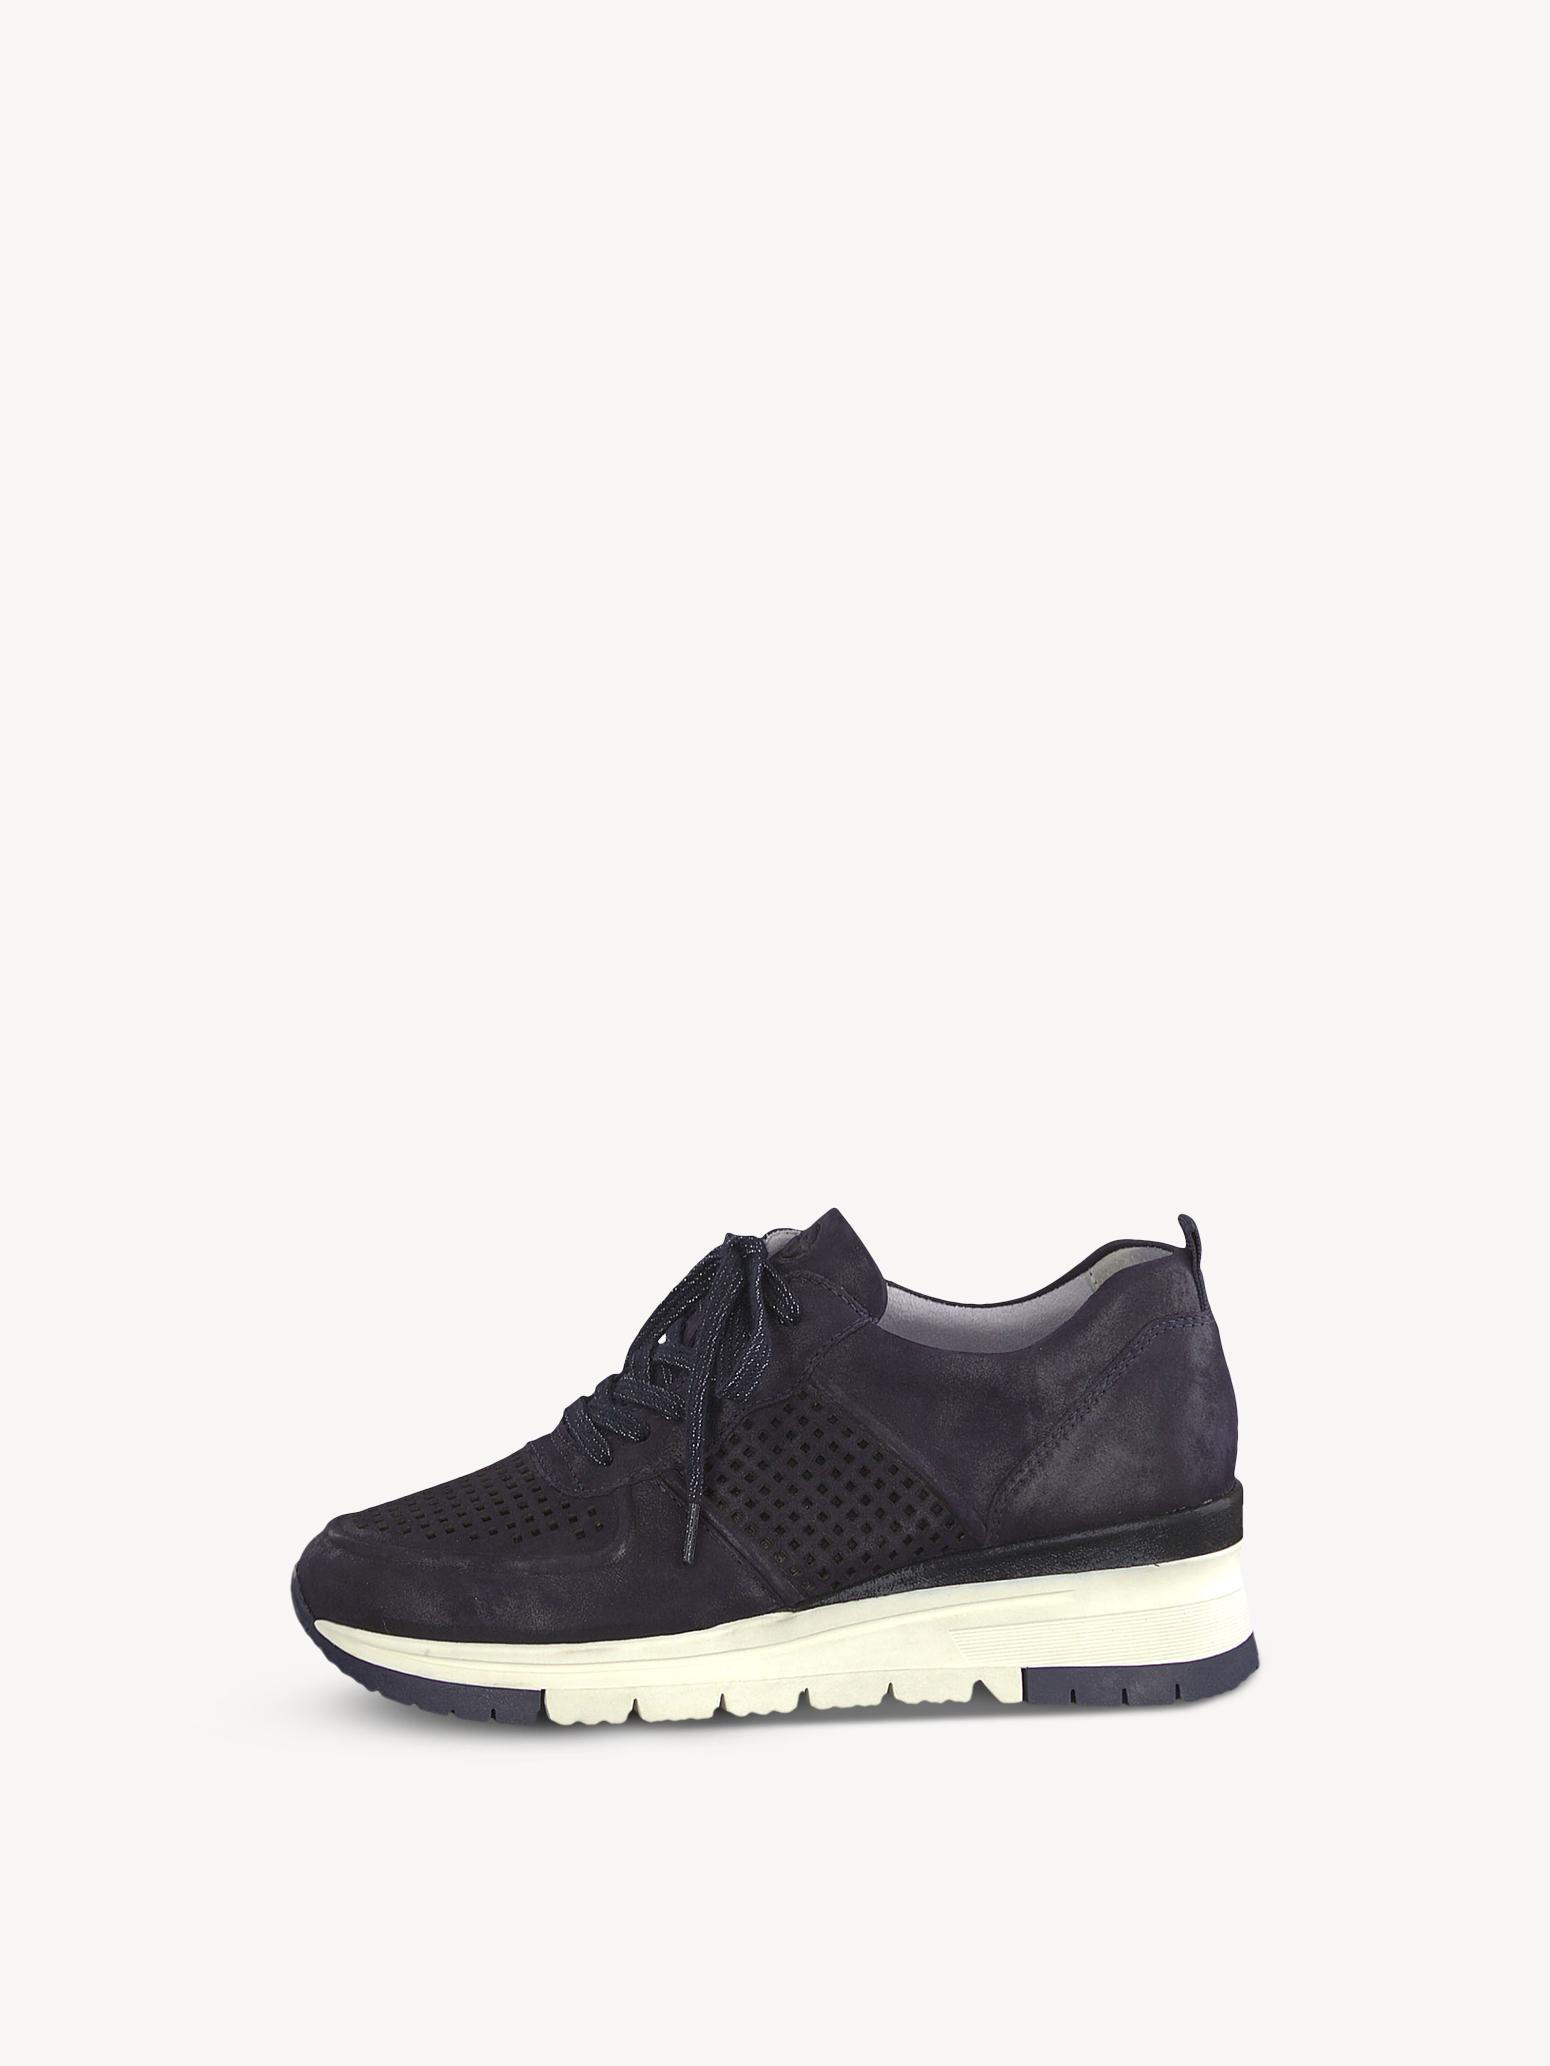 promo code 560f1 c3a51 Tamaris Schuhe Schuhe Blau Sneaker Tamaris Sneaker nw8Ok0P